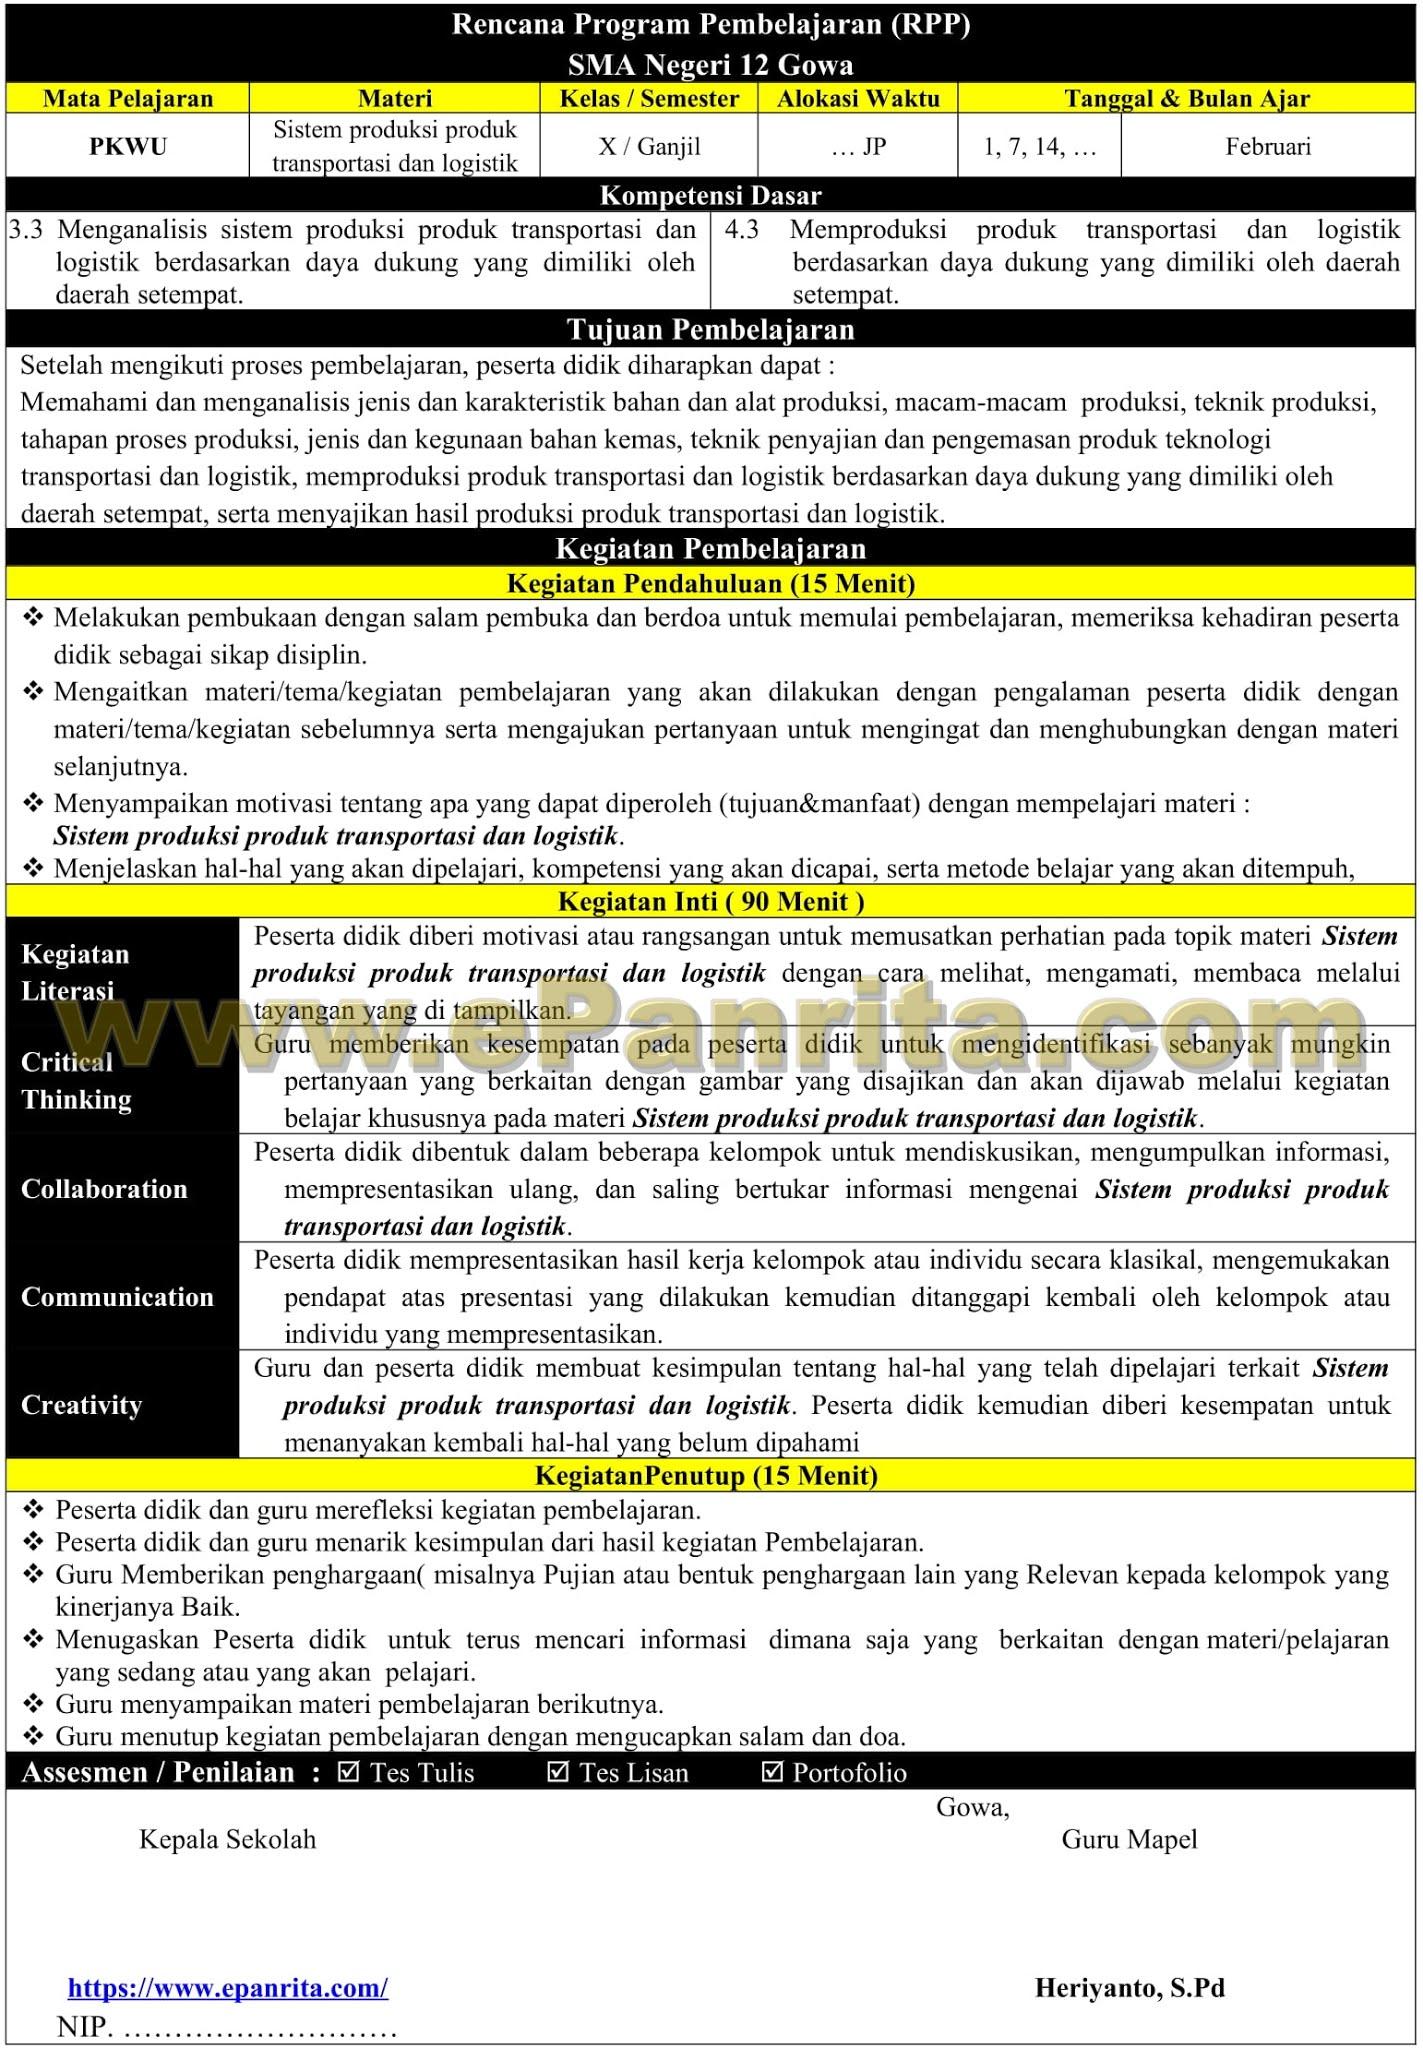 RPP 1 Halaman Prakarya Aspek Rekayasa (Sistem produksi produk transportasi dan logistik)